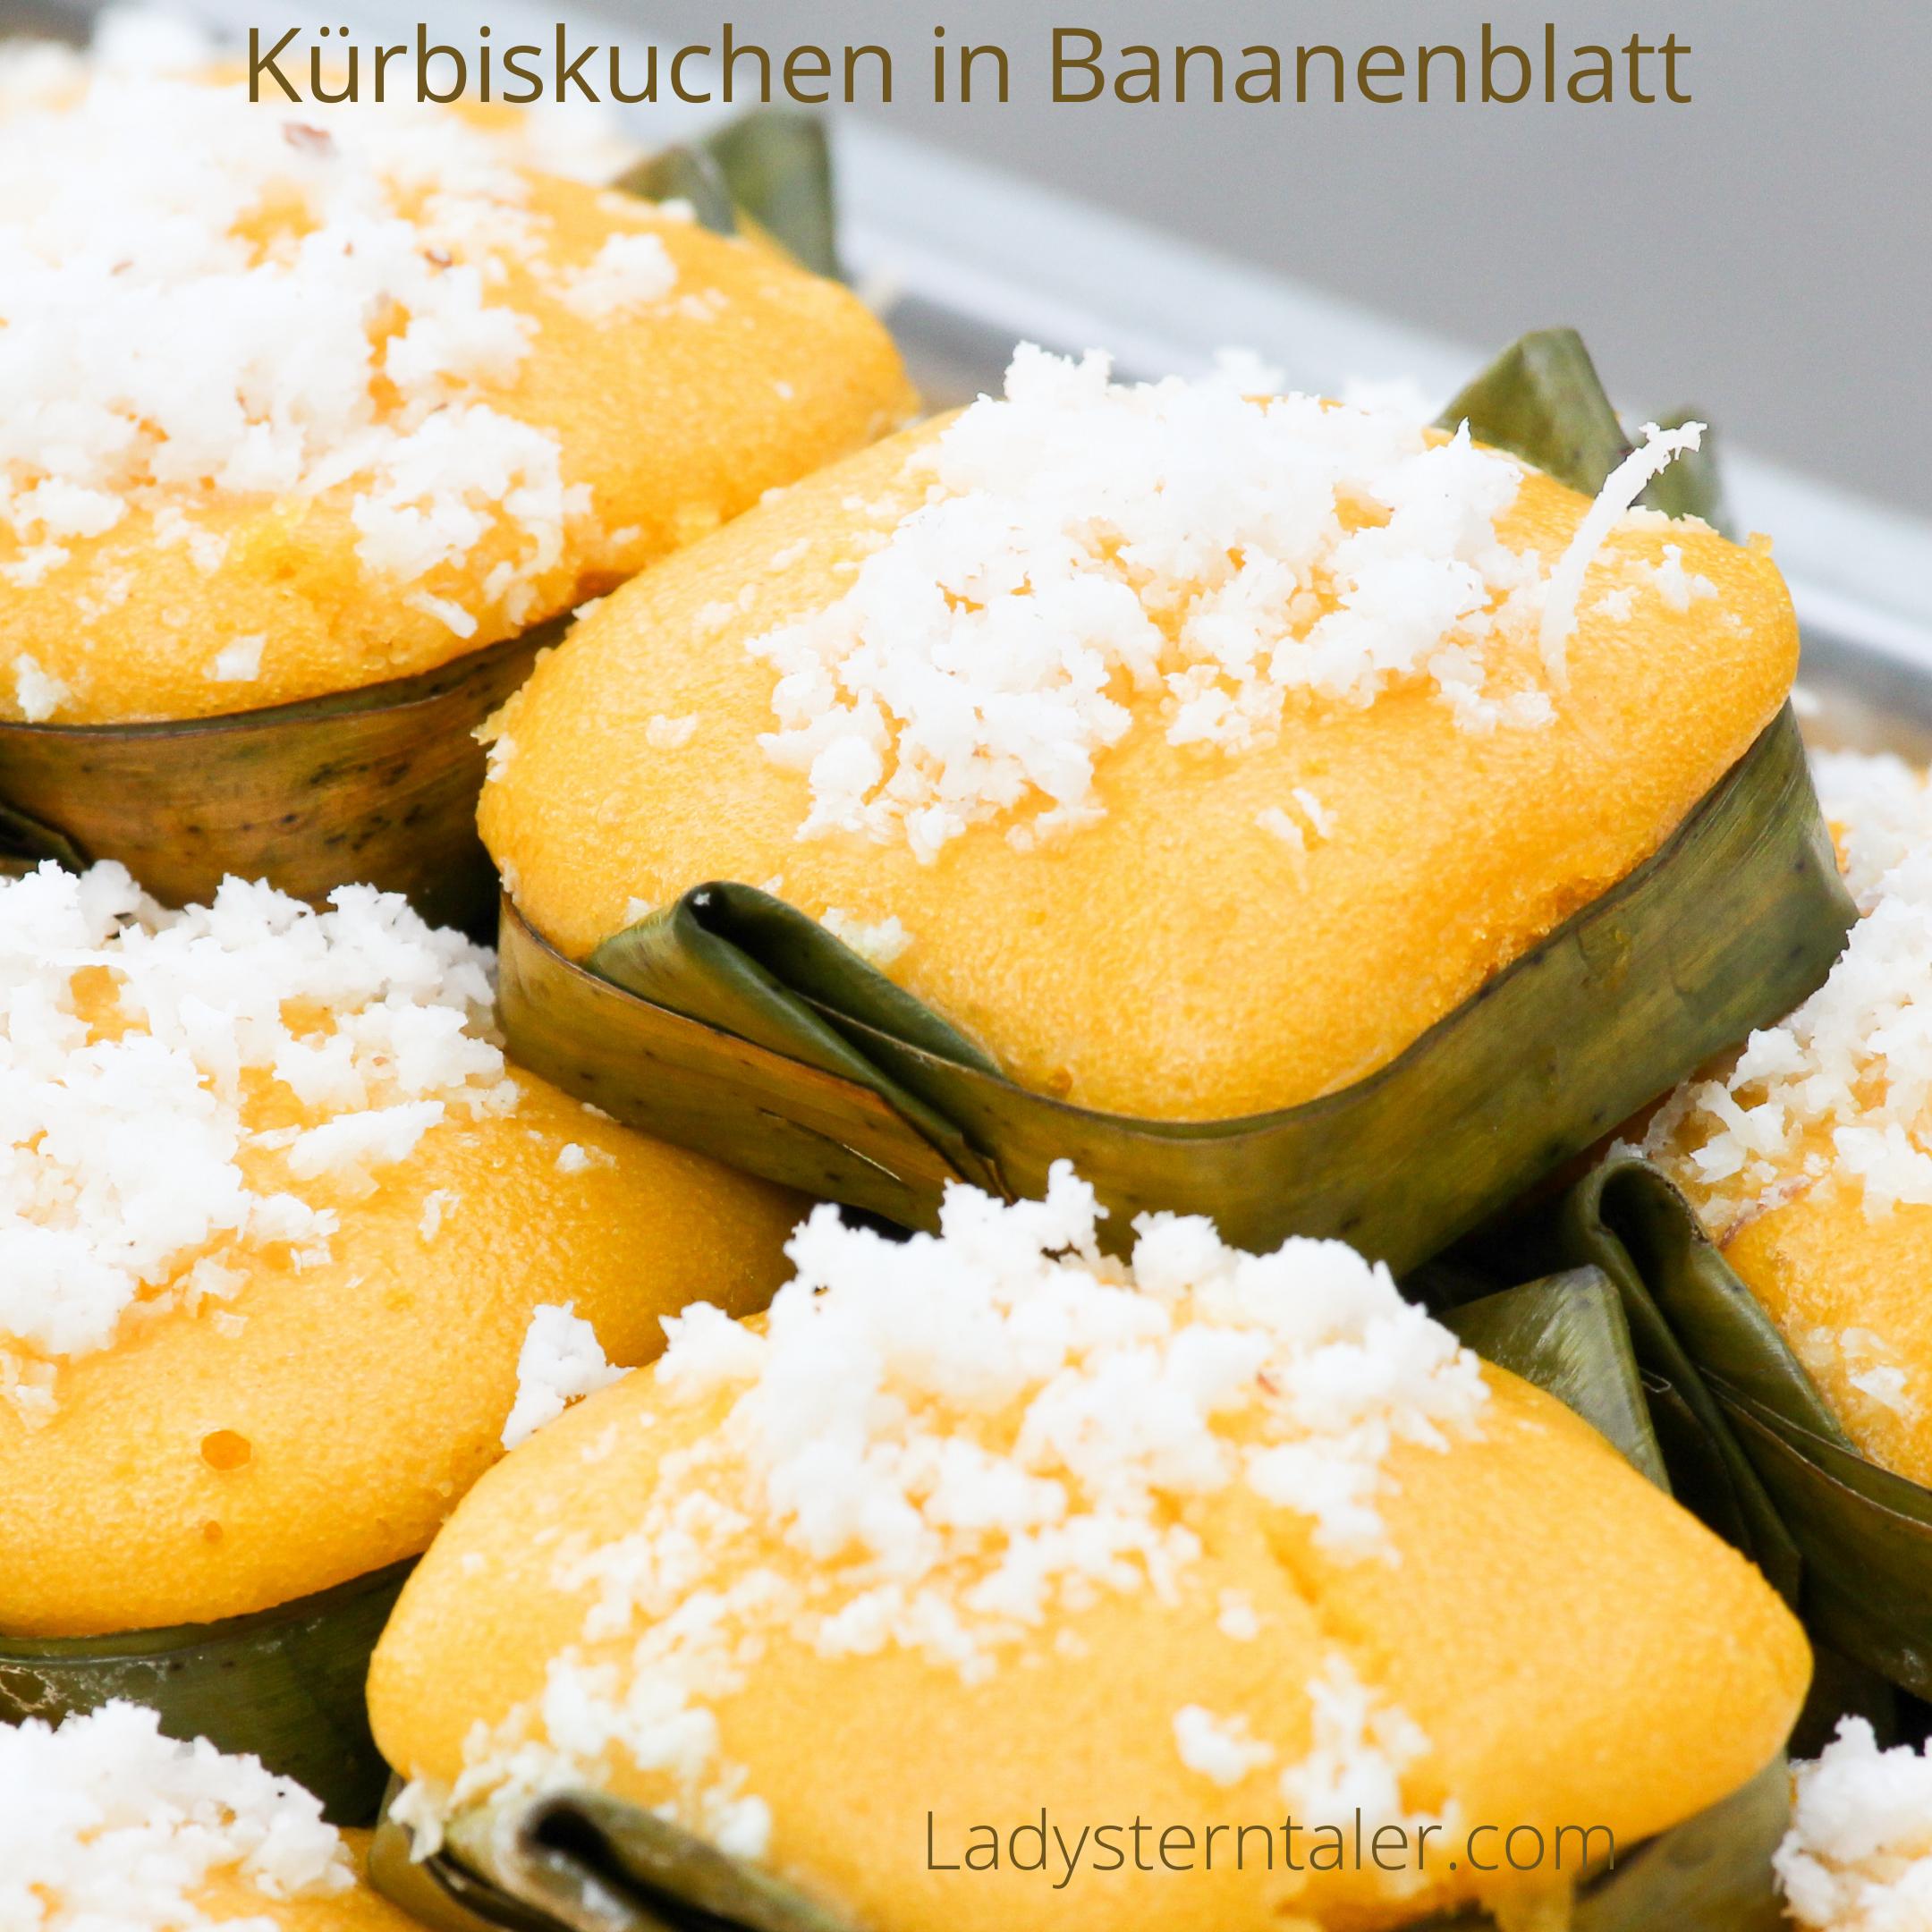 Kürbiskuchen in Bananenblatt (1)